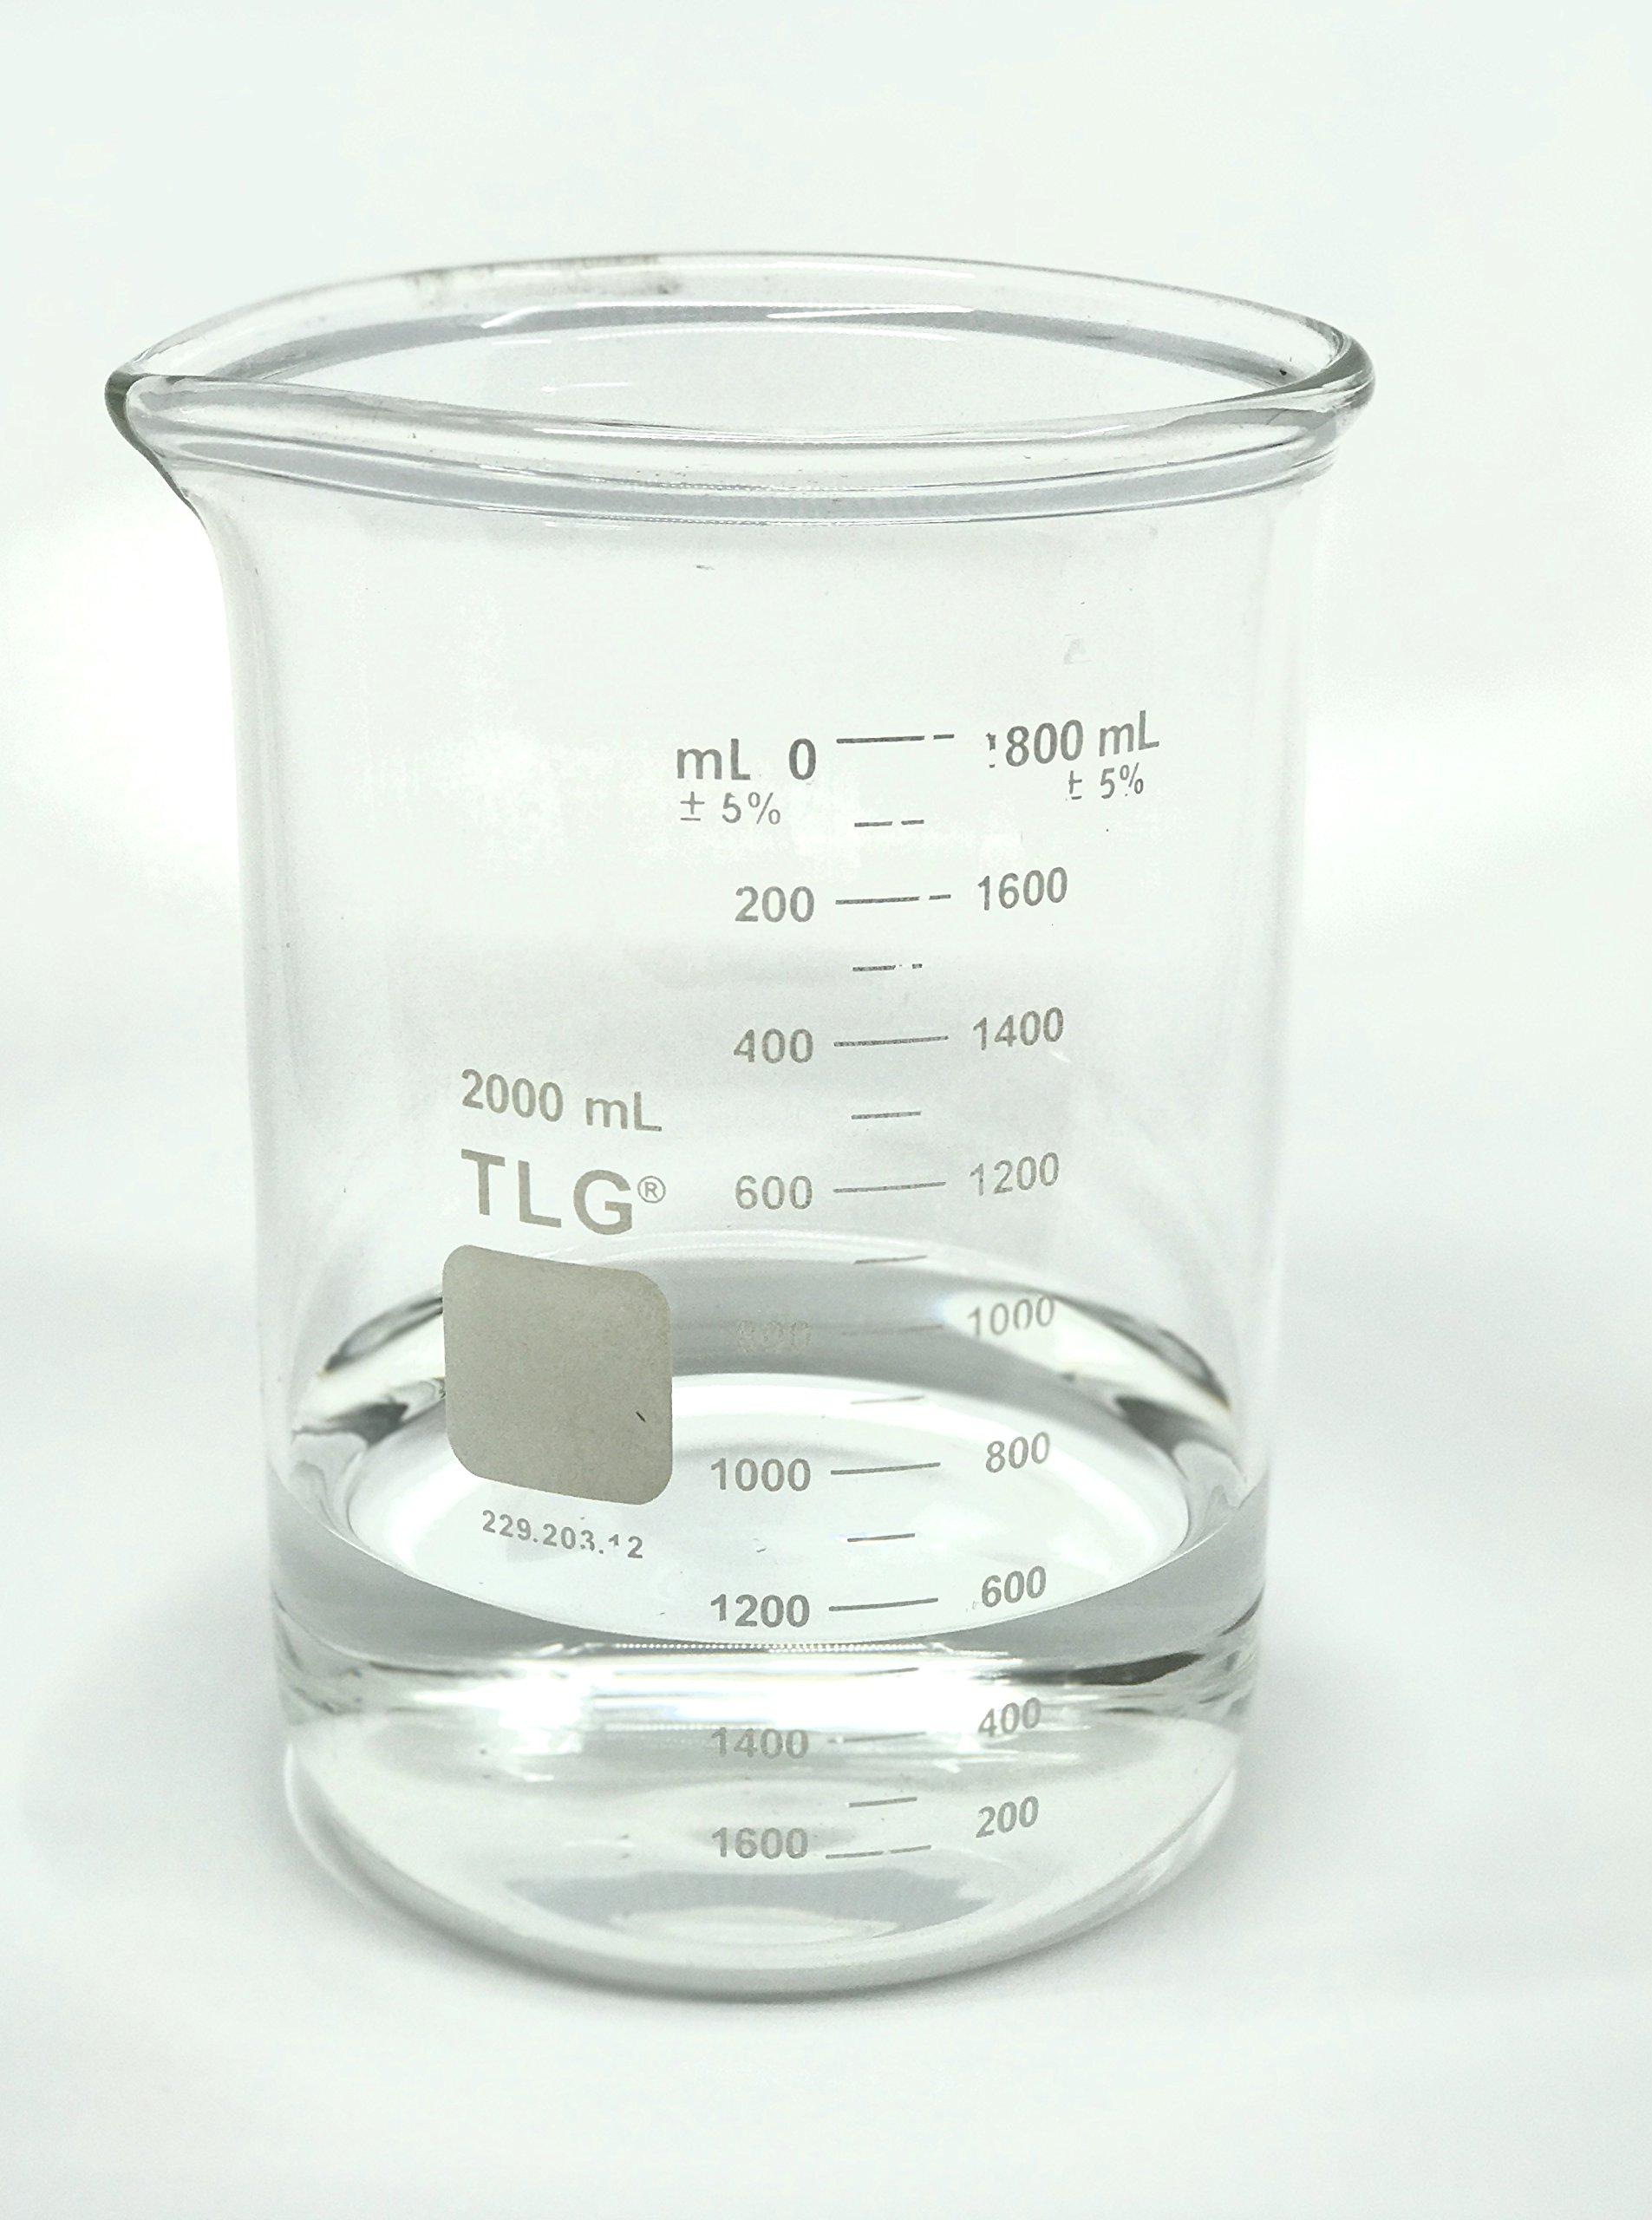 Chem Science INC 229.203.12 Heavy Duty, Graduated Beaker, 2000 Ml, 2000Milliliters, Degree C, Borosilicate Glass, (